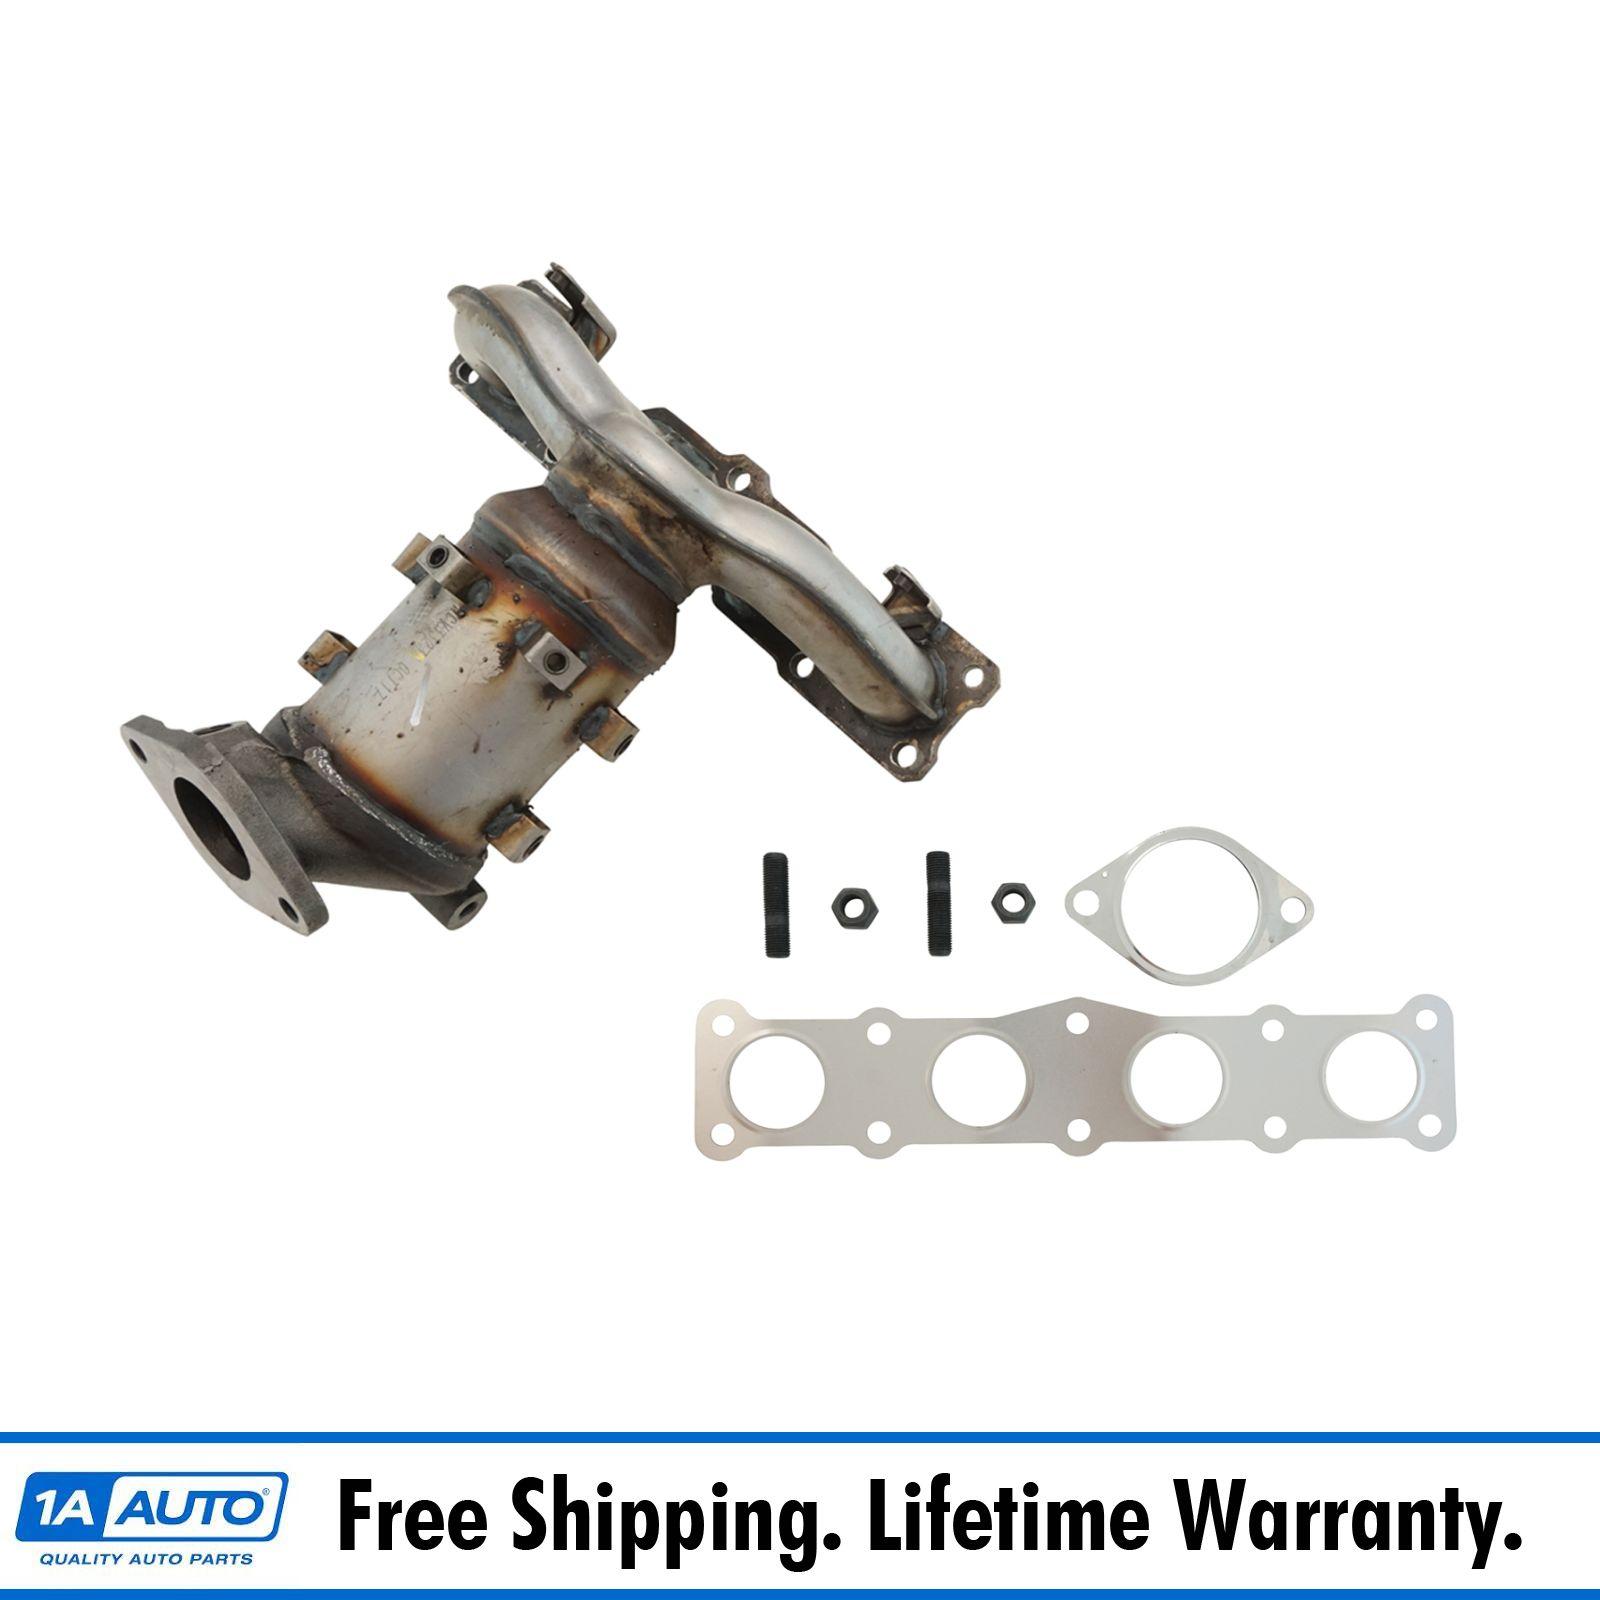 Exhaust Manifold w// Catalytic Converter Gaskets /& Hardware for Hyundai Kia New